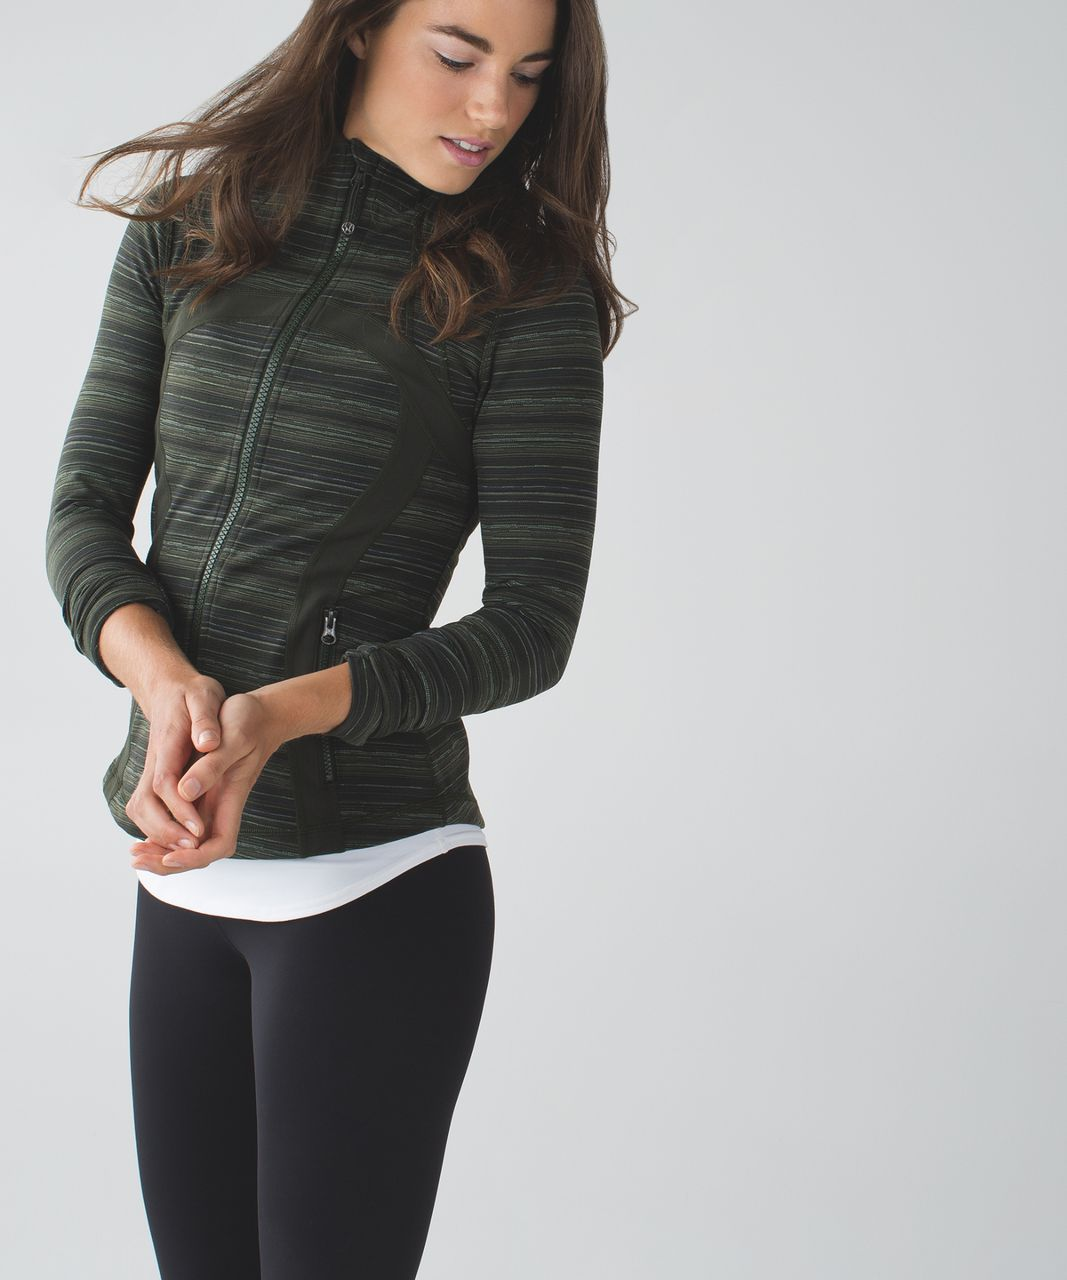 Lululemon Define Jacket - Cyber Stripe Gator Green Black